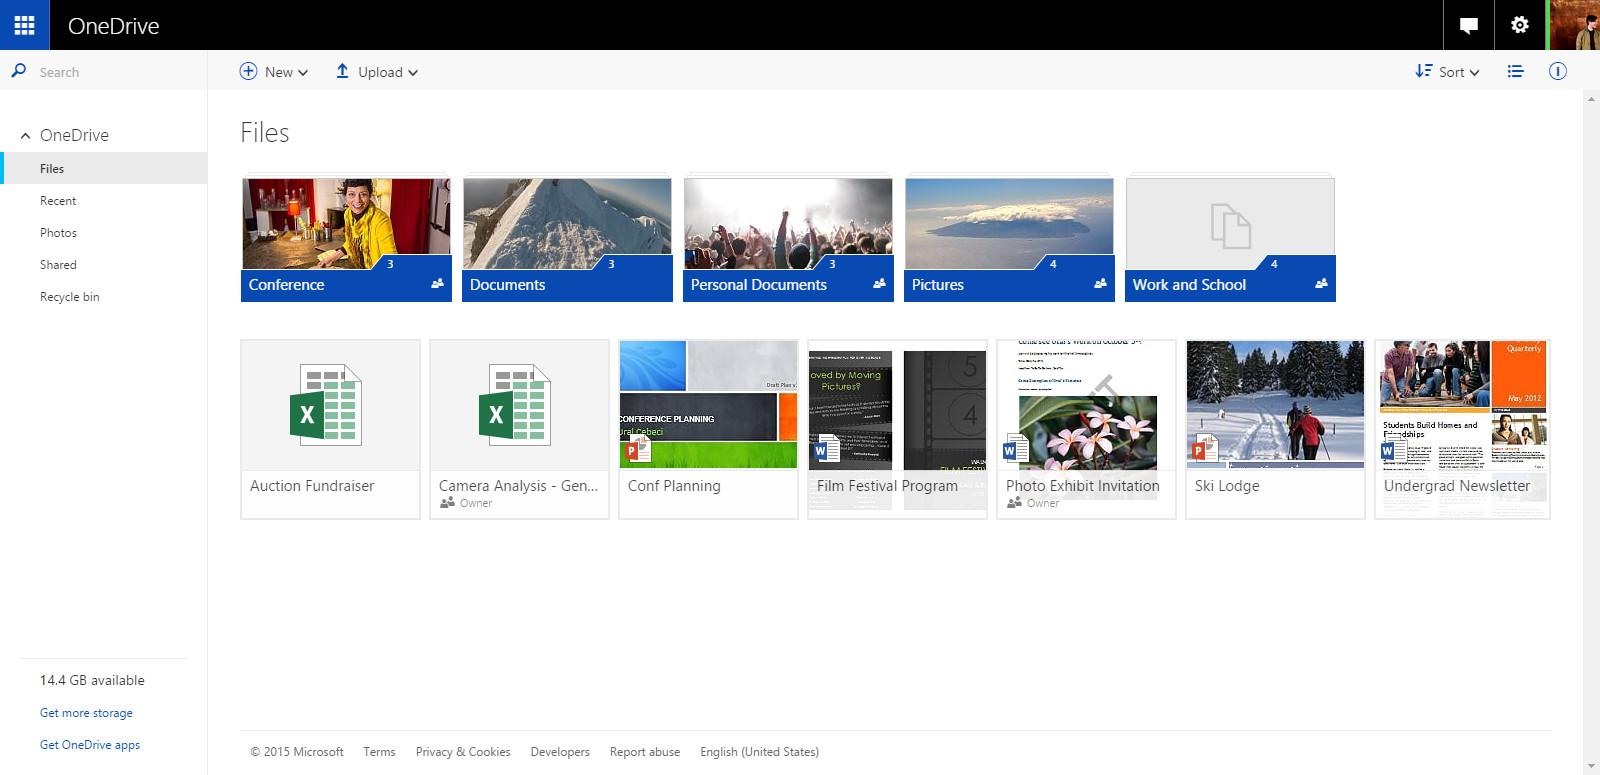 OneDrive webUI